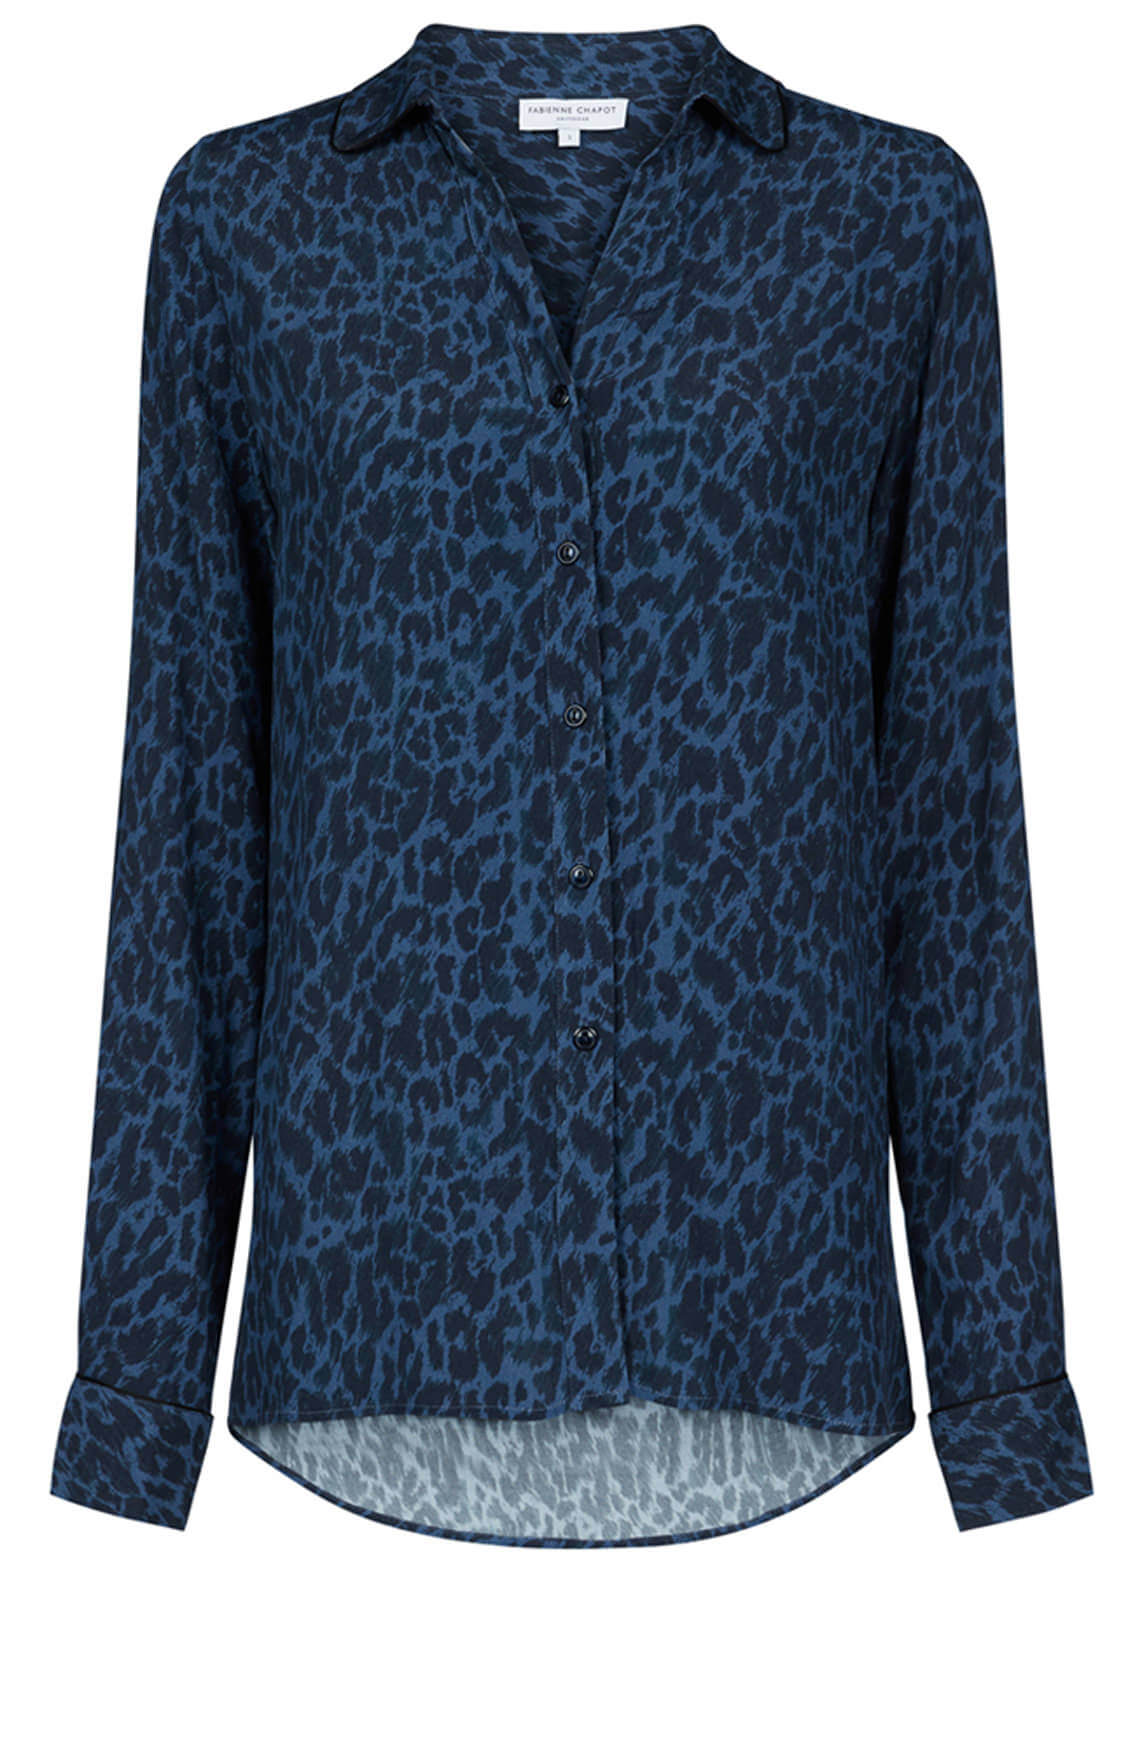 Fabienne Chapot Dames Panterprint blouse Blauw